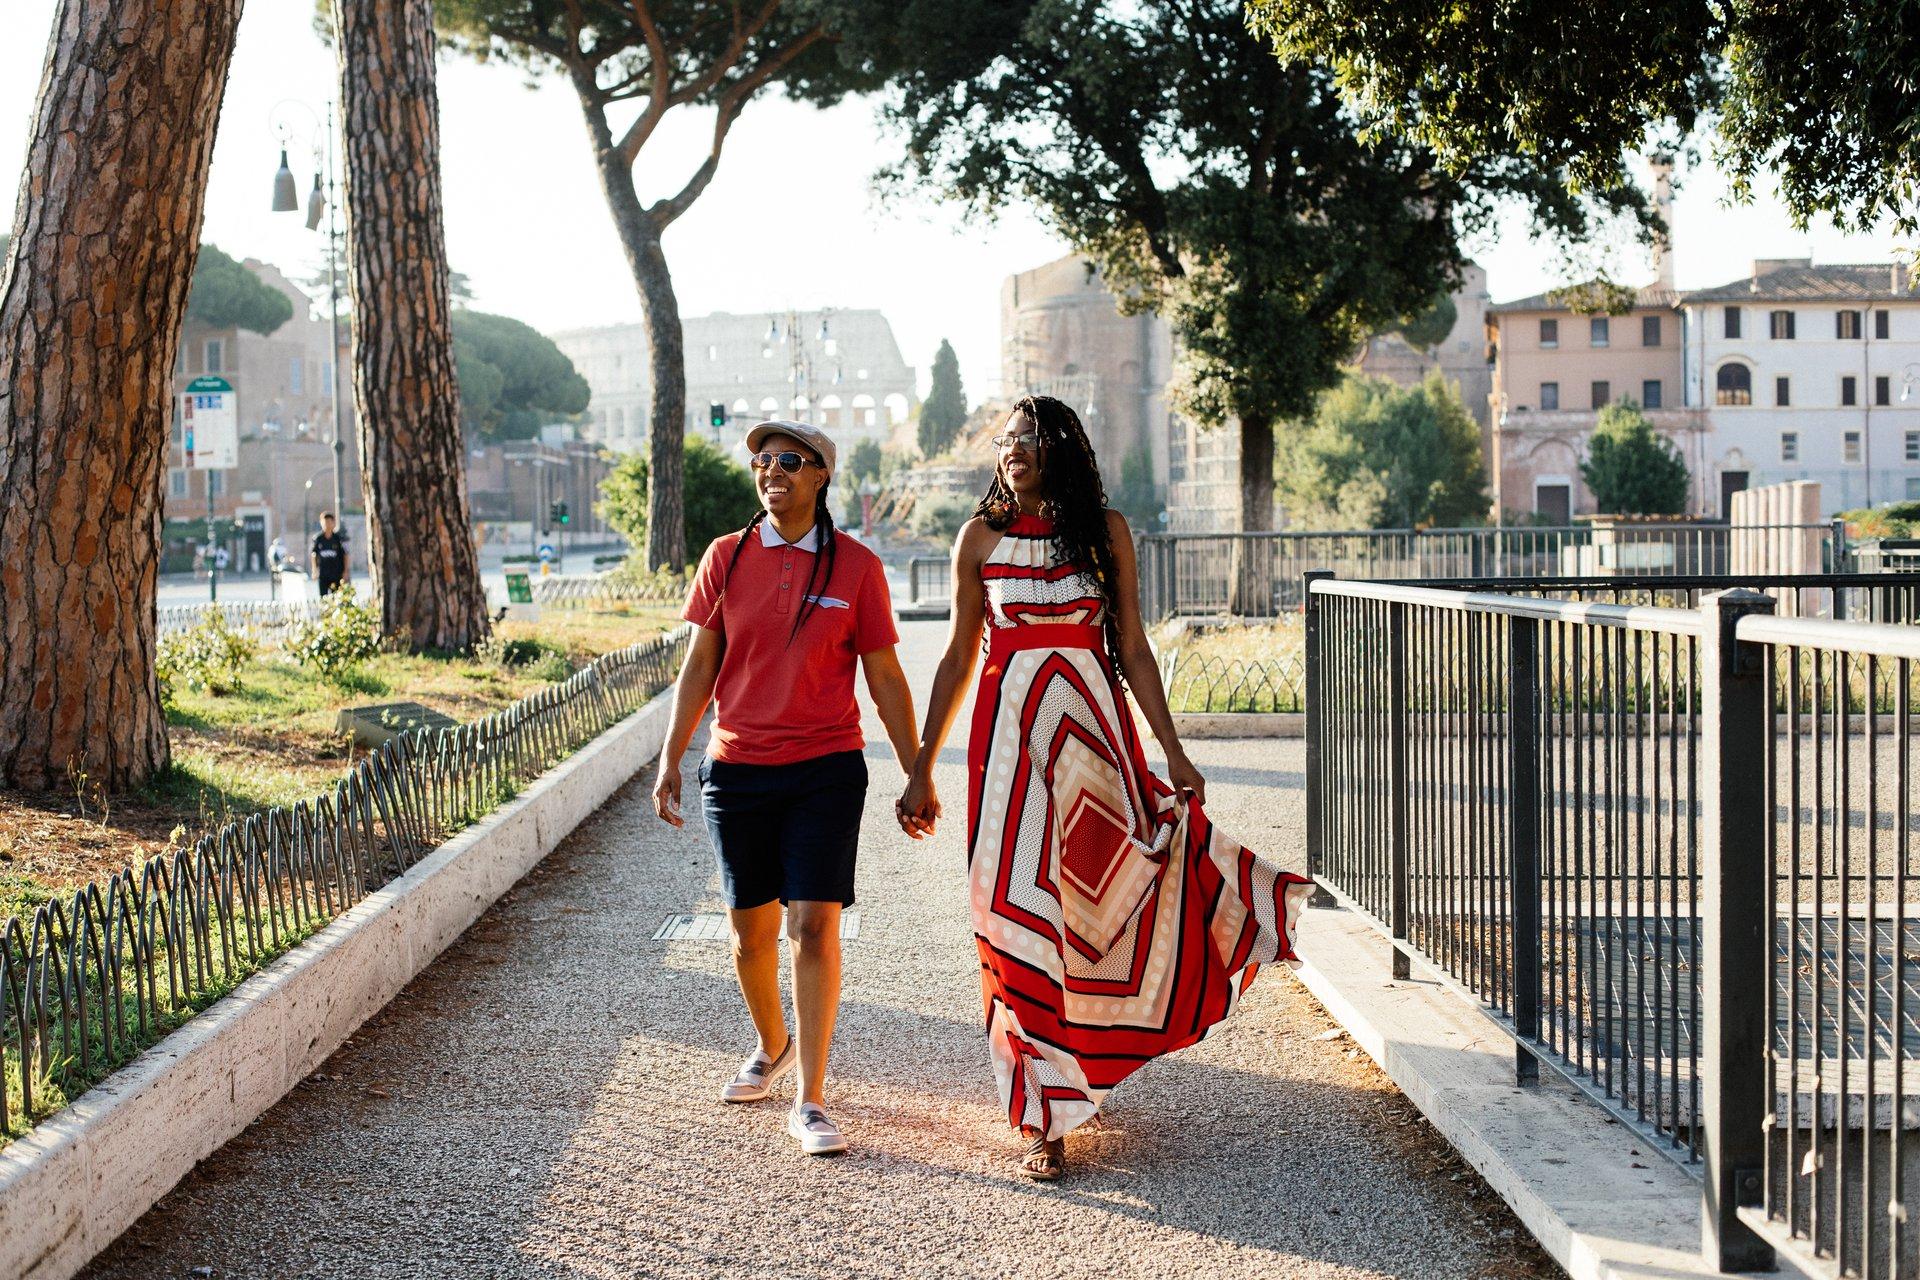 Rome-Italy-travel-story-Flytographer-14